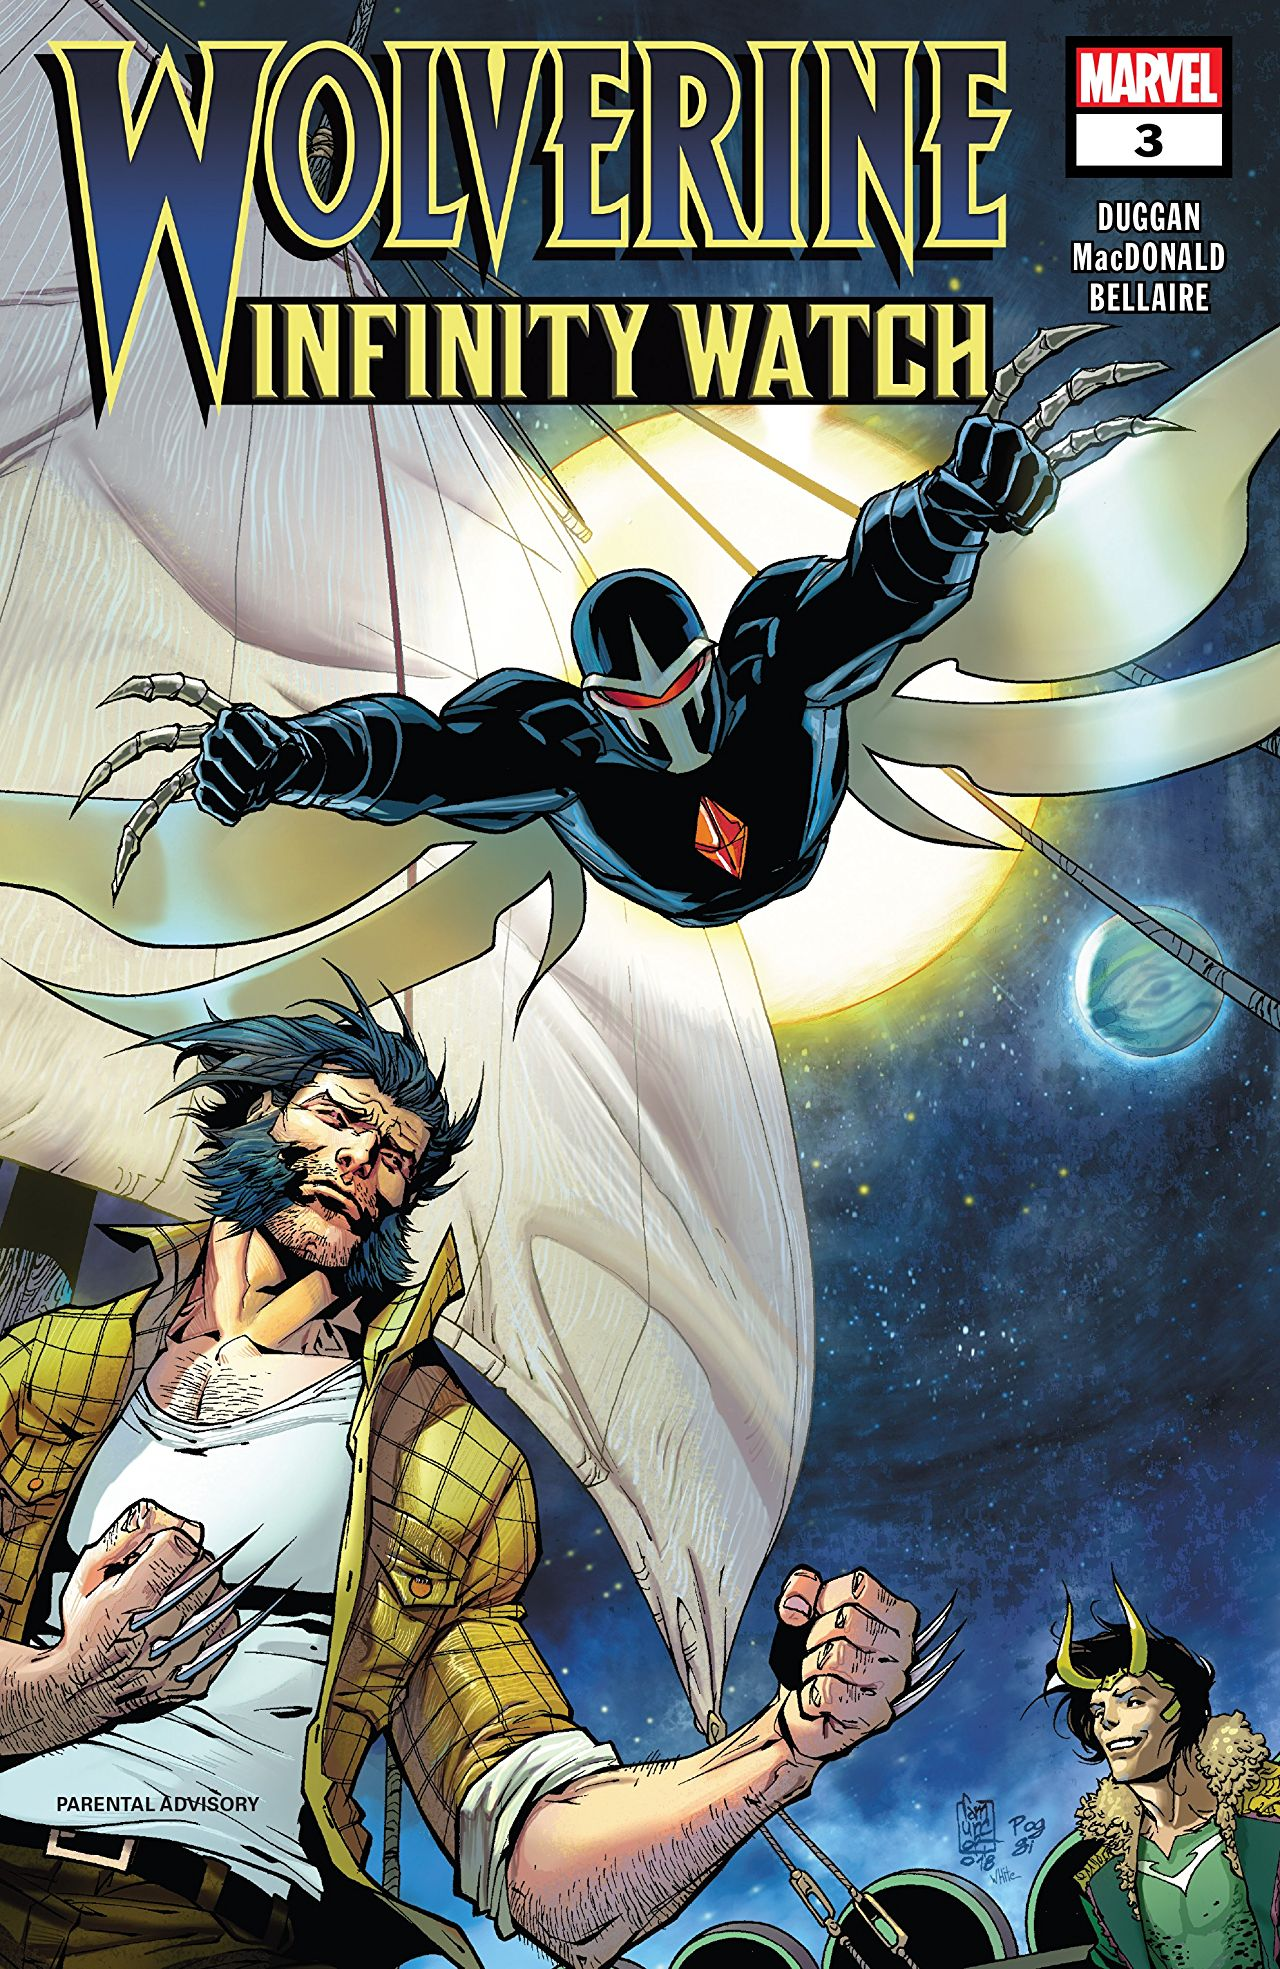 Wolverine - Infinity Watch 3